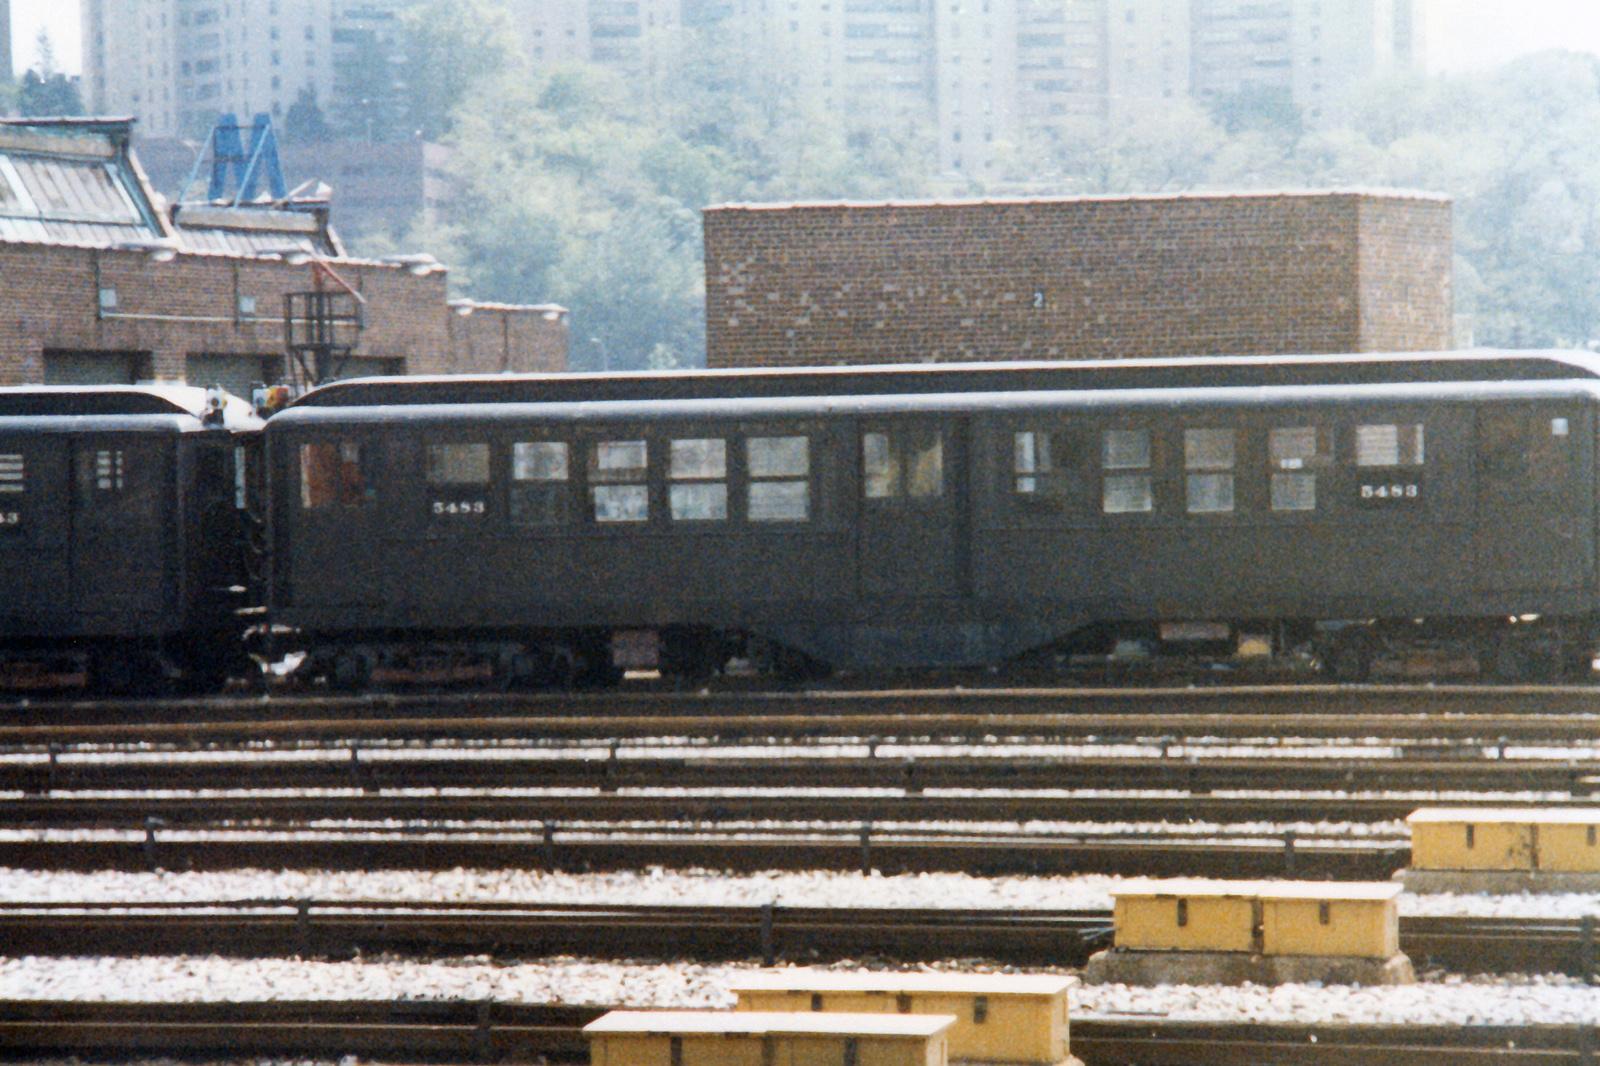 (905k, 1600x1066)<br><b>Country:</b> United States<br><b>City:</b> New York<br><b>System:</b> New York City Transit<br><b>Location:</b> 207th Street Yard<br><b>Car:</b> Low-V (Museum Train) 5483 <br><b>Collection of:</b> Nicholas Fabrizio<br><b>Viewed (this week/total):</b> 32 / 113